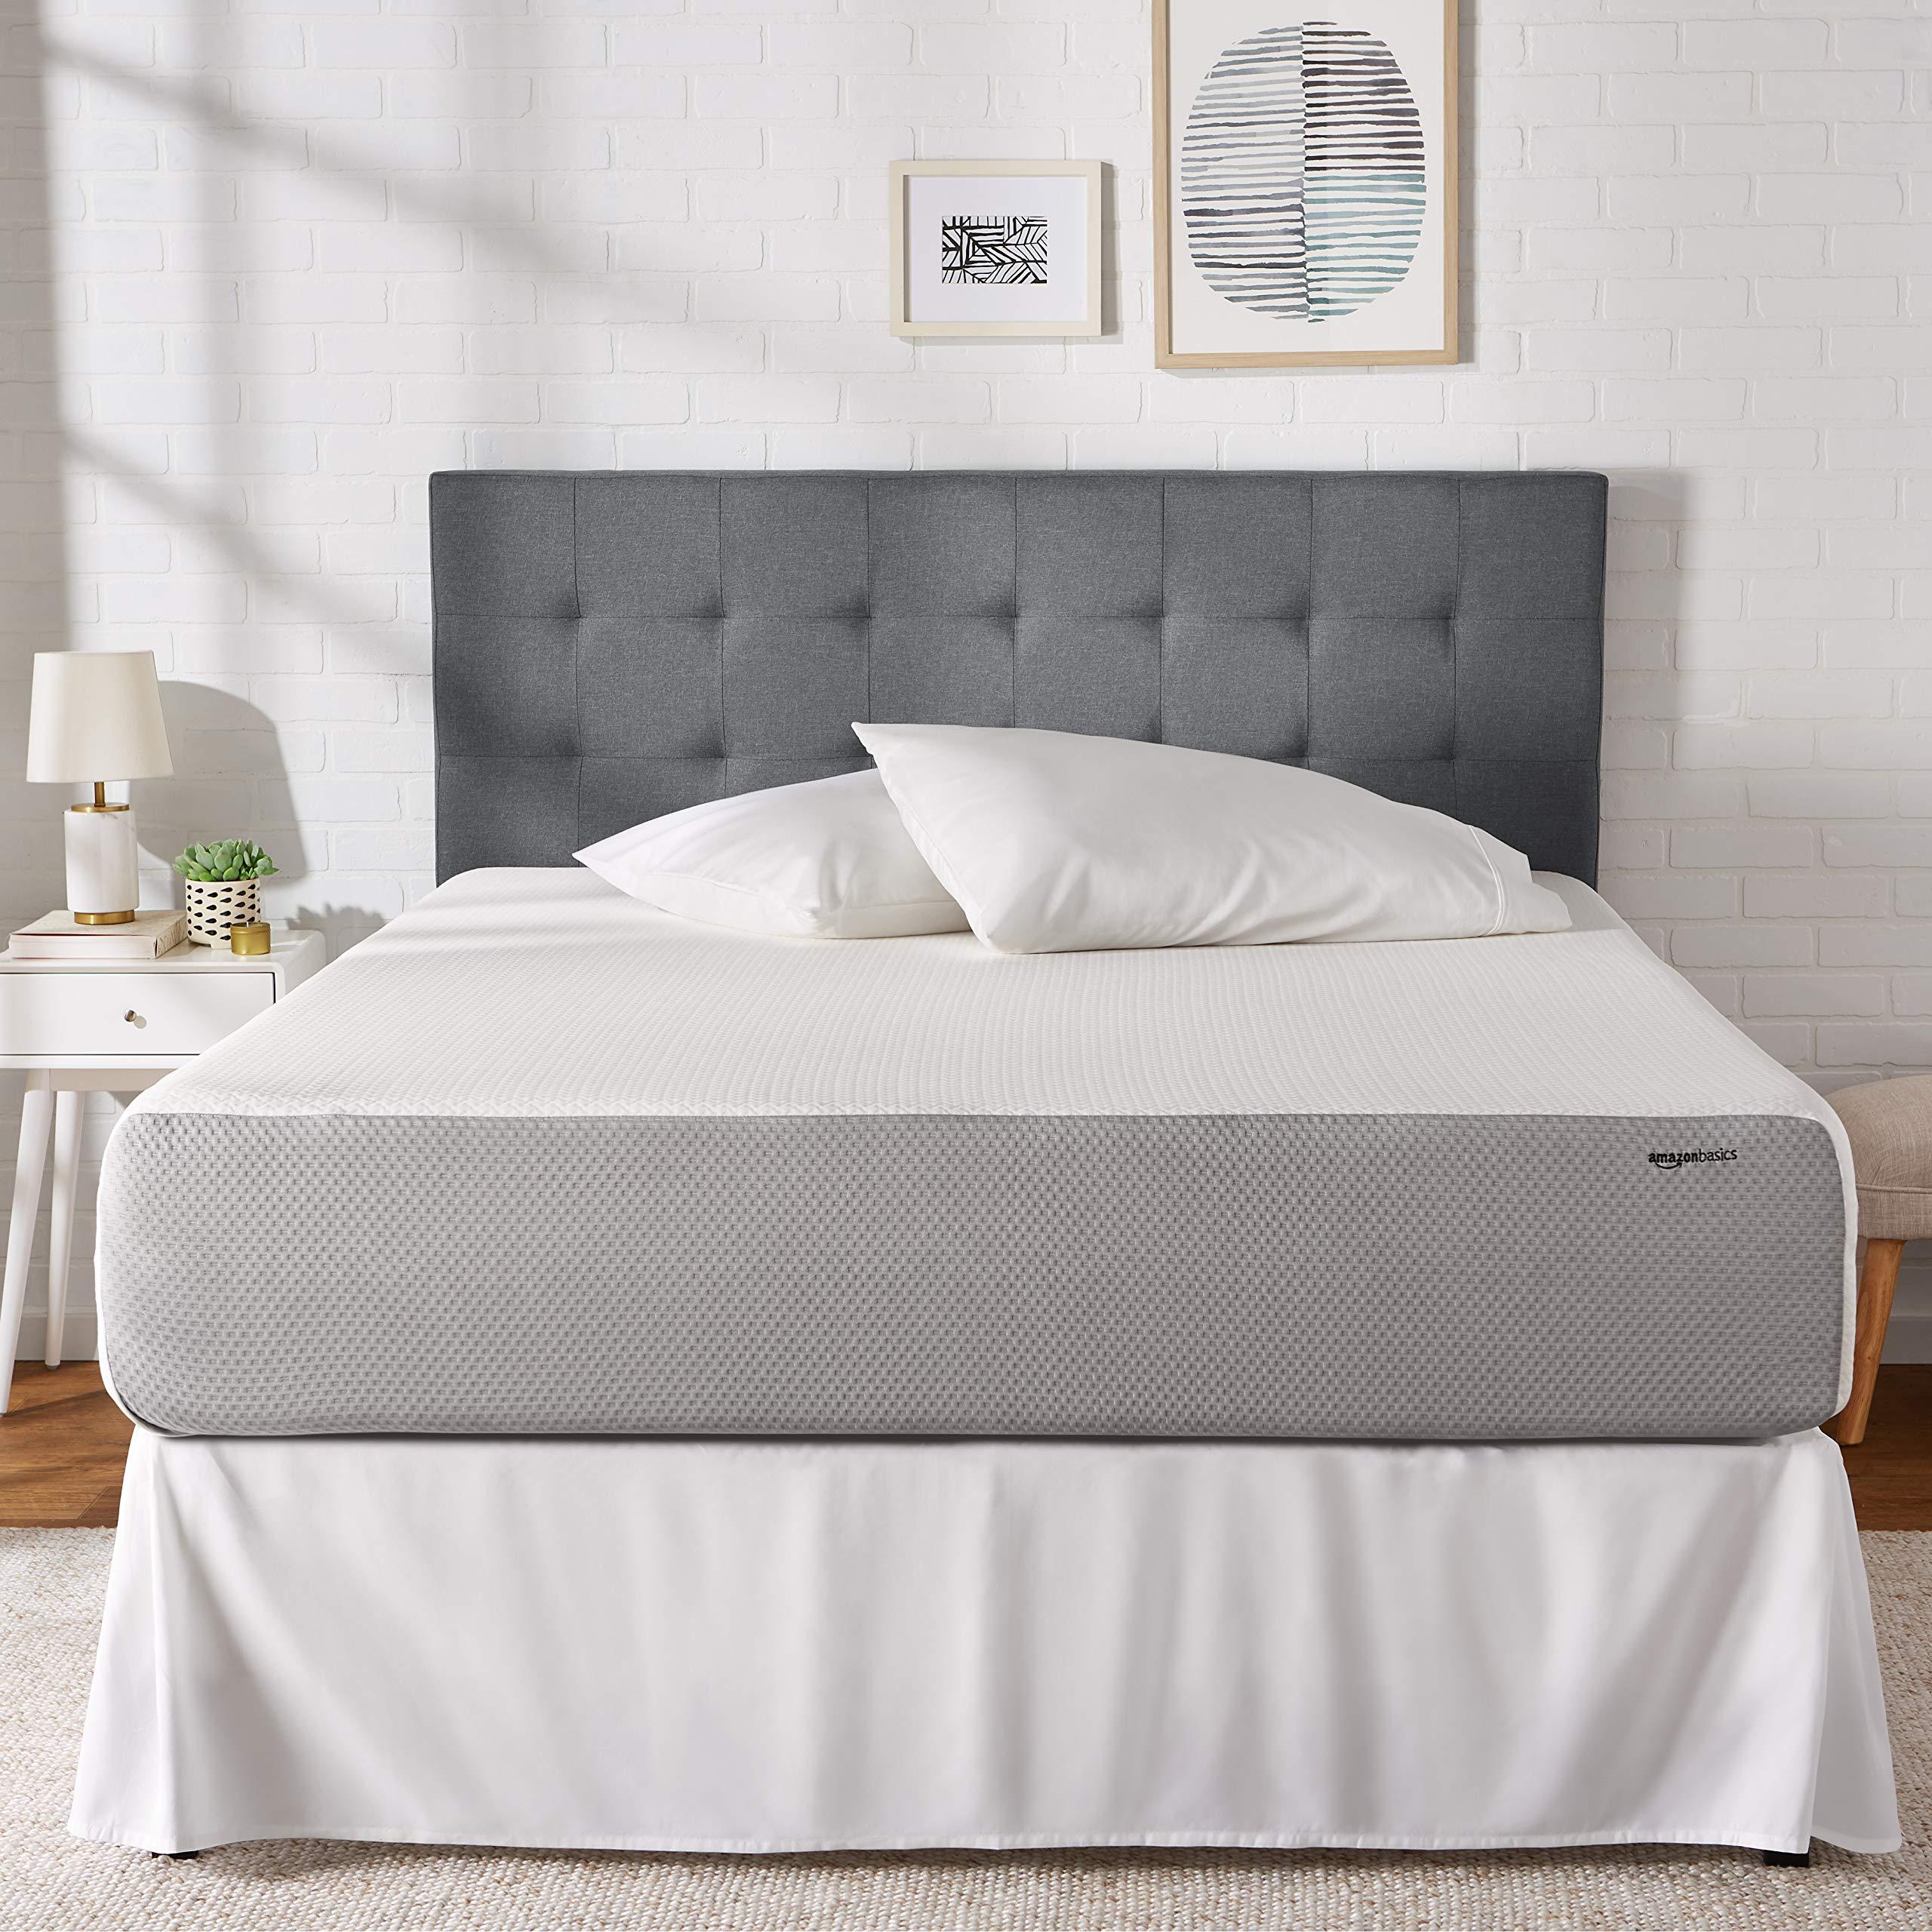 AmazonBasics Memory Foam Mattress - Soft Bed, Plush Feel, CertiPUR-US Certified - 12-Inch, Queen Size